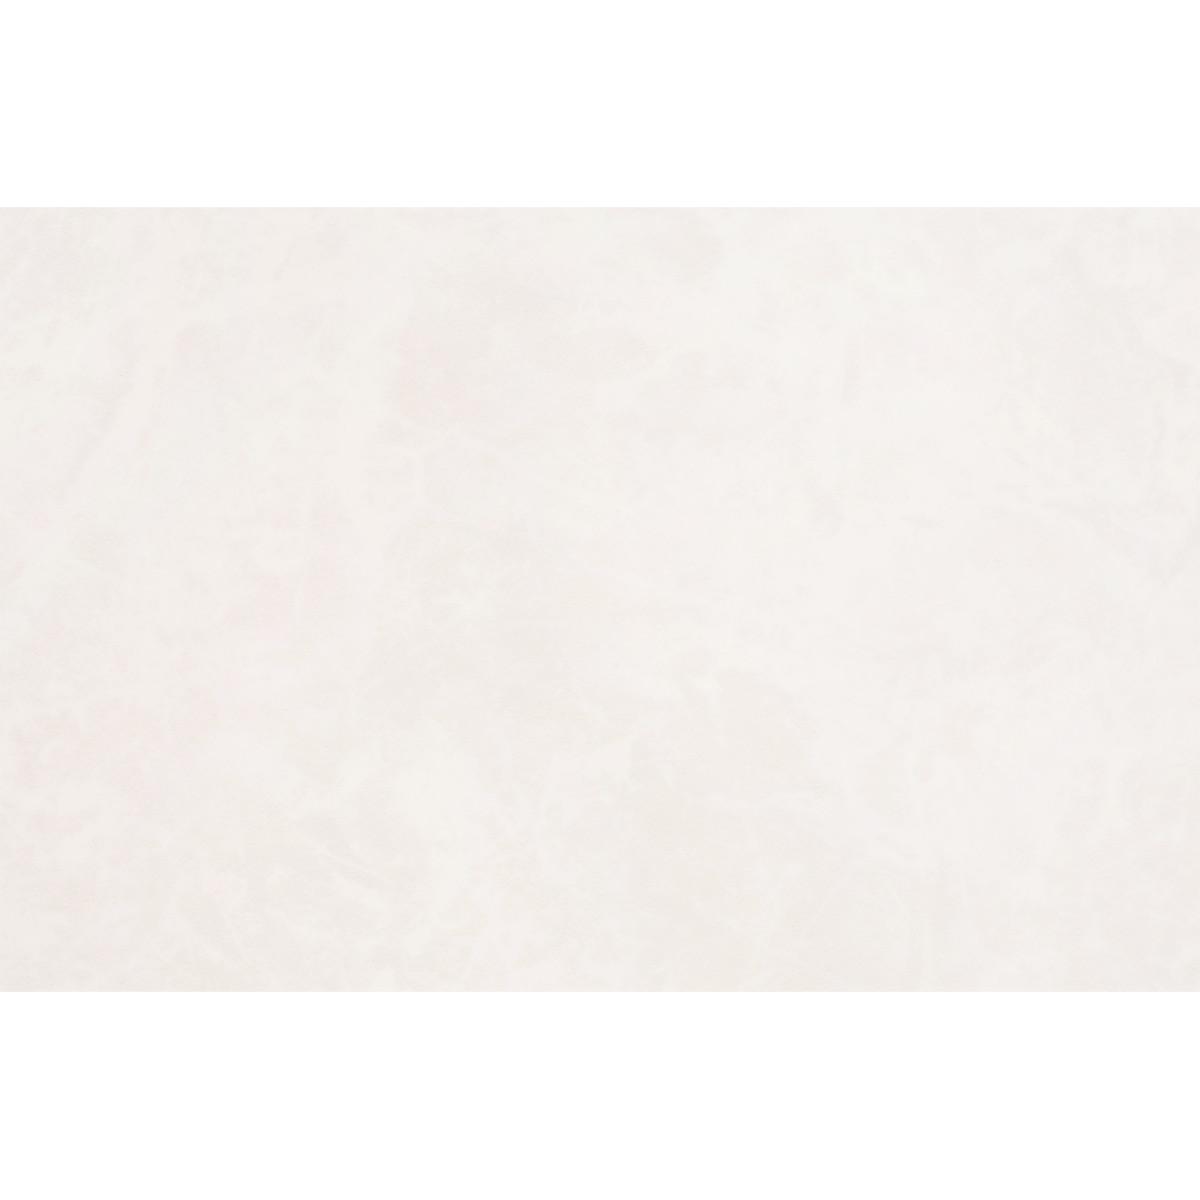 Плитка настенная Мрамор 30x20 см 1.2 м² цвет светло-серый